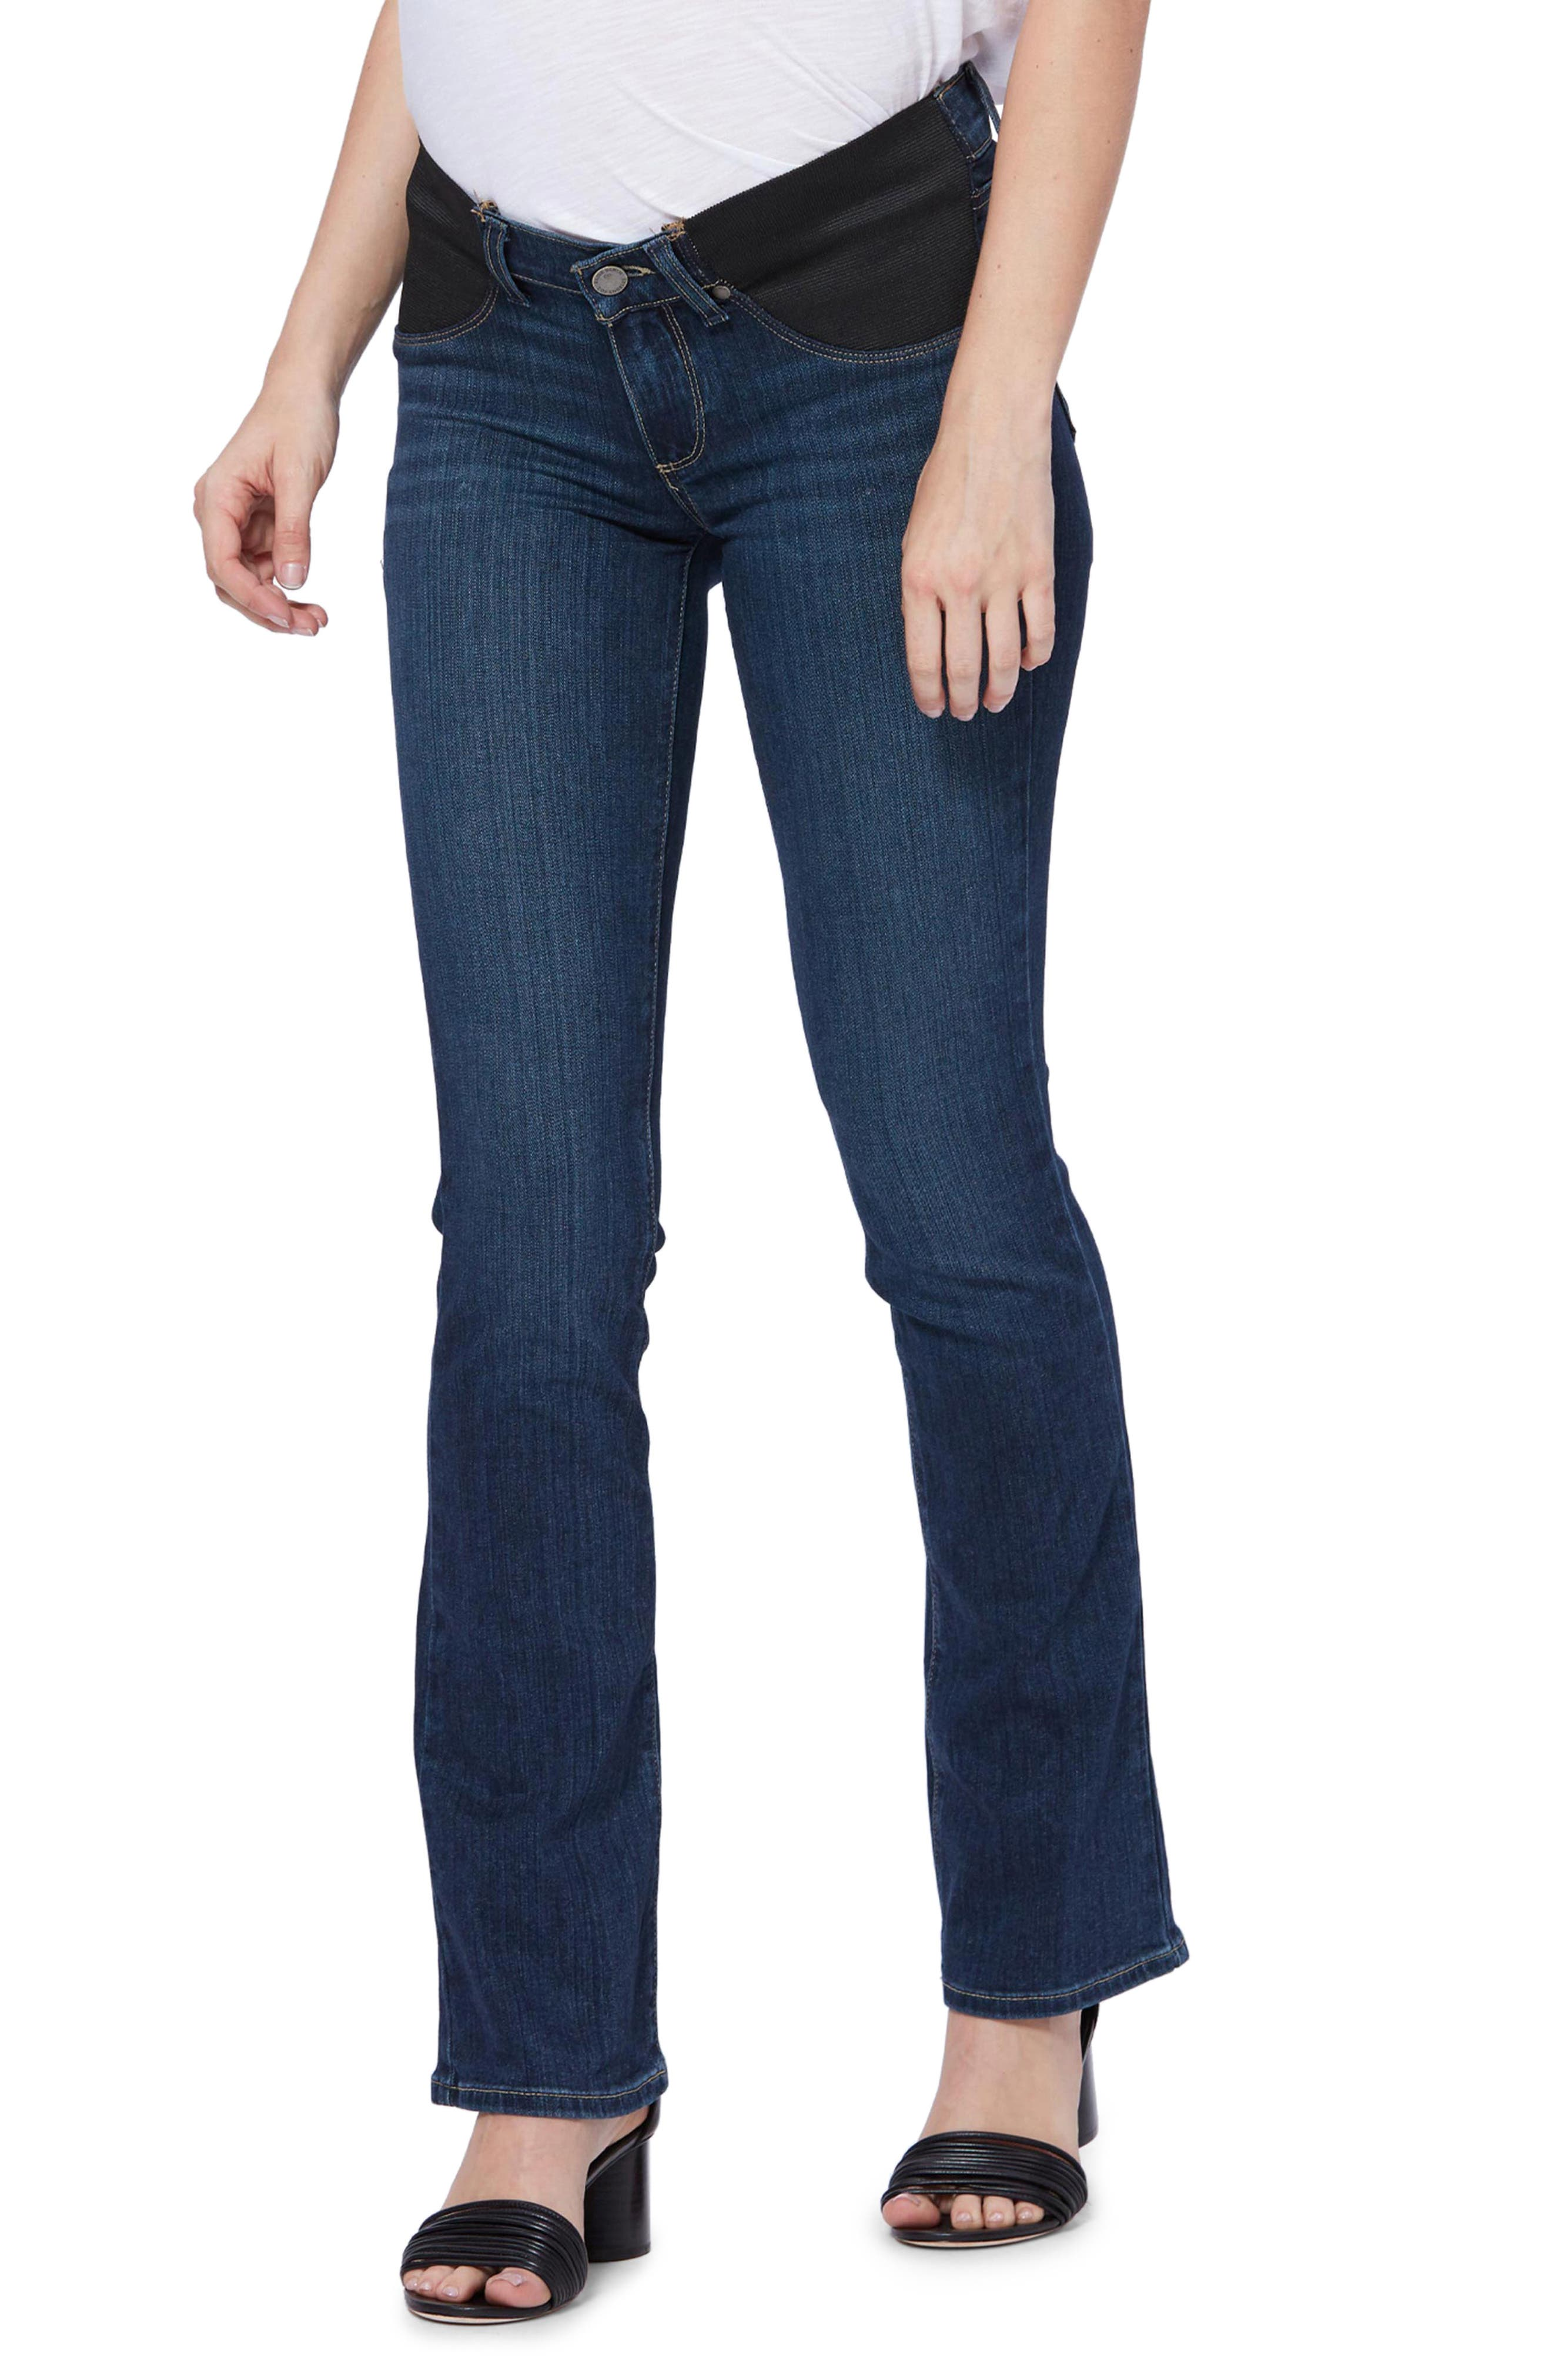 Women's Paige Transcend - Manhattan Maternity Bootcut Jeans